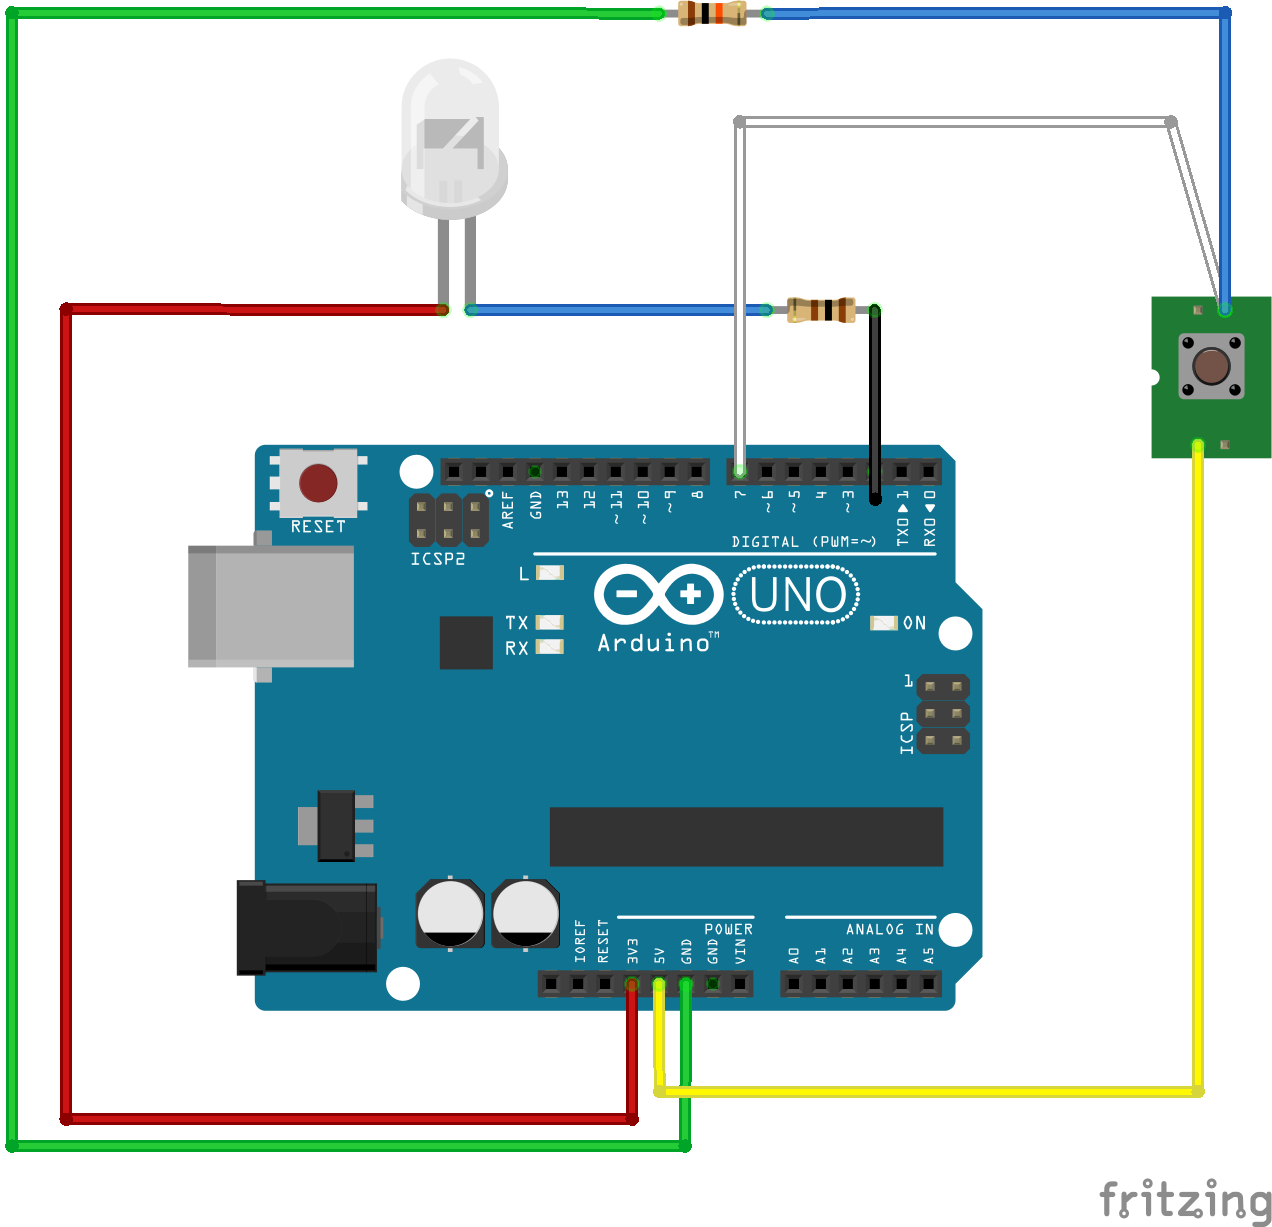 Push Button Schematic Diagram - House Wiring Diagram Symbols •